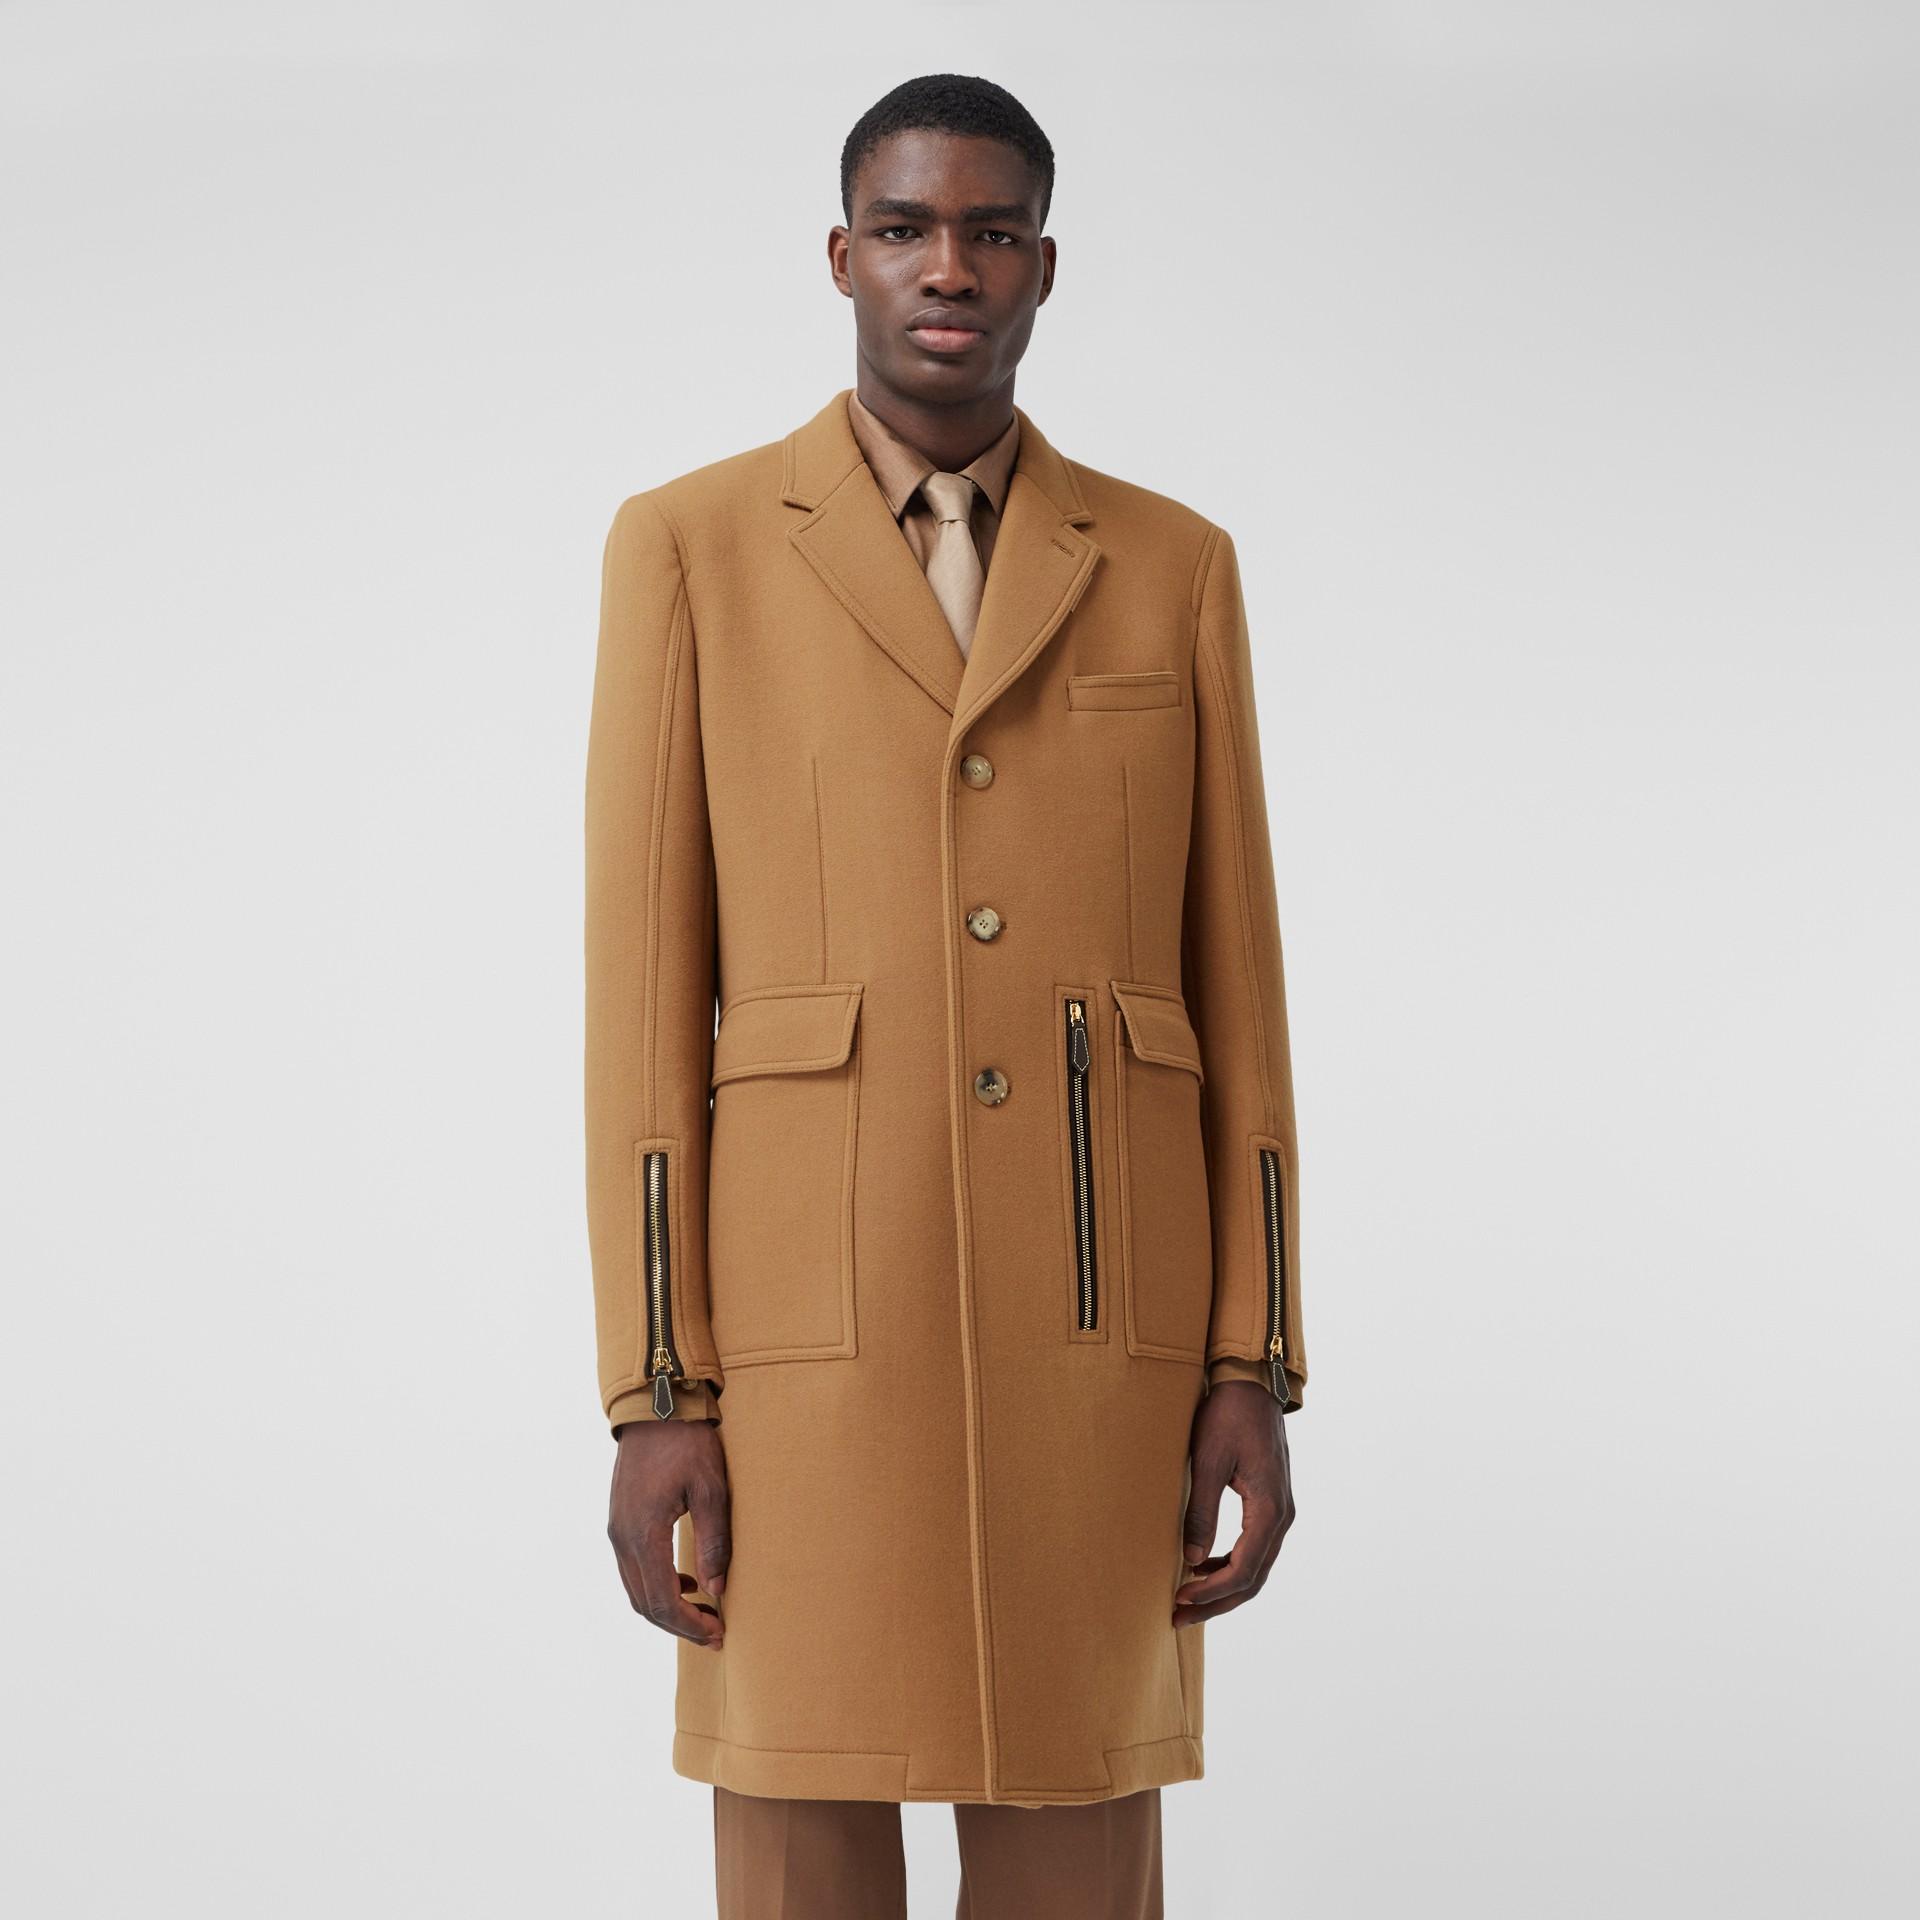 Zip Detail Wool Tailored Coat in Warm Camel - Men | Burberry - gallery image 6